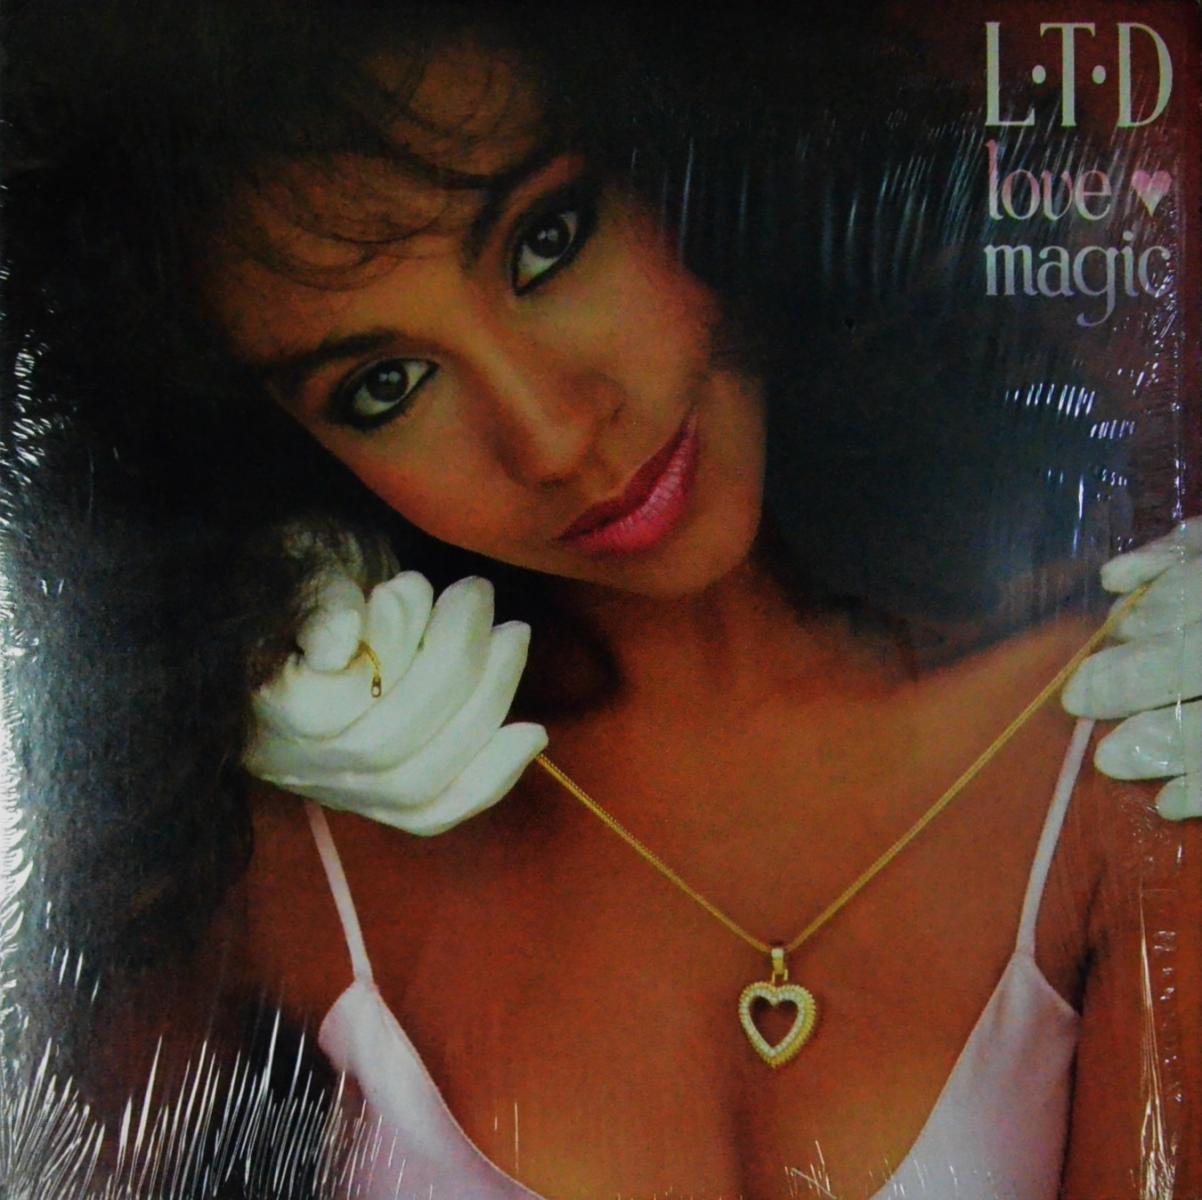 L.T.D. / LOVE MAGIC (LP)